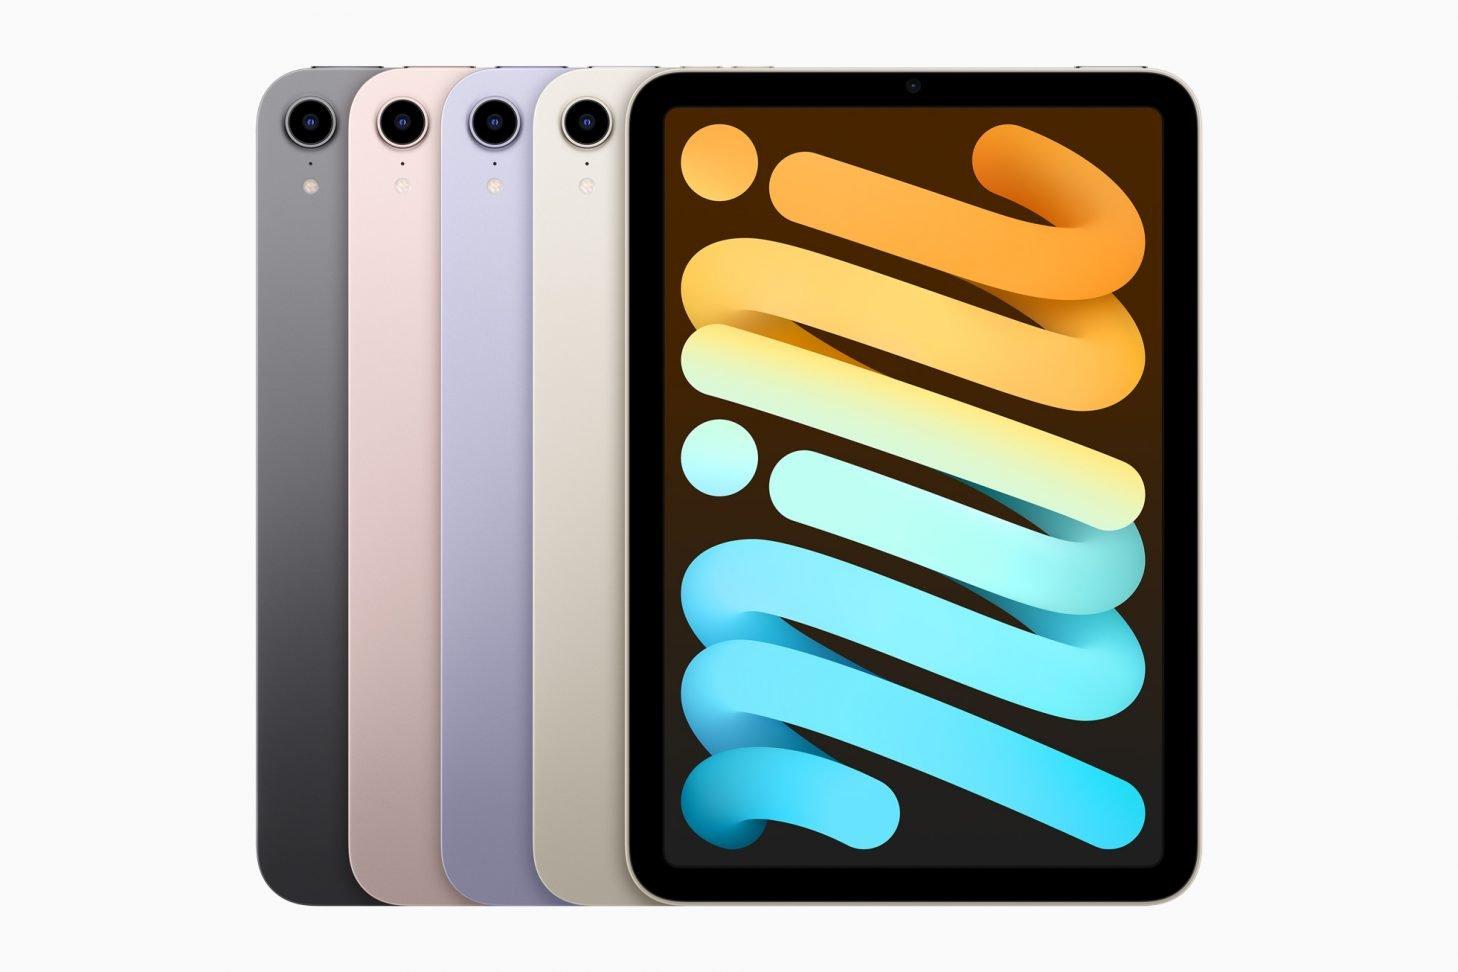 Apple iPad mini colors 09142021 1